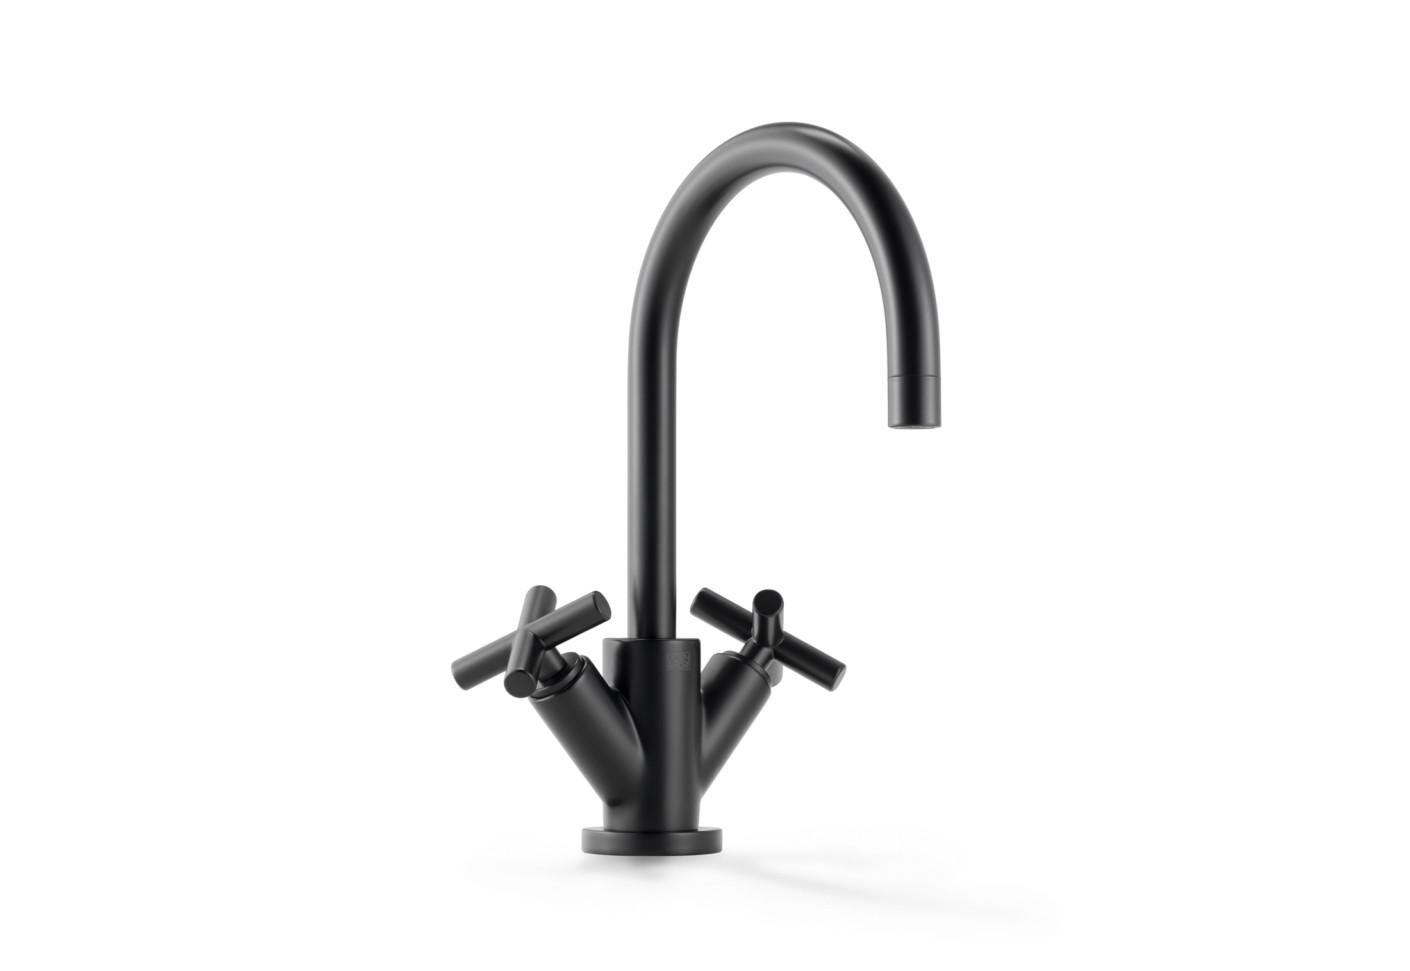 Tara black singlehole basin mixer by Dornbracht  STYLEPARK